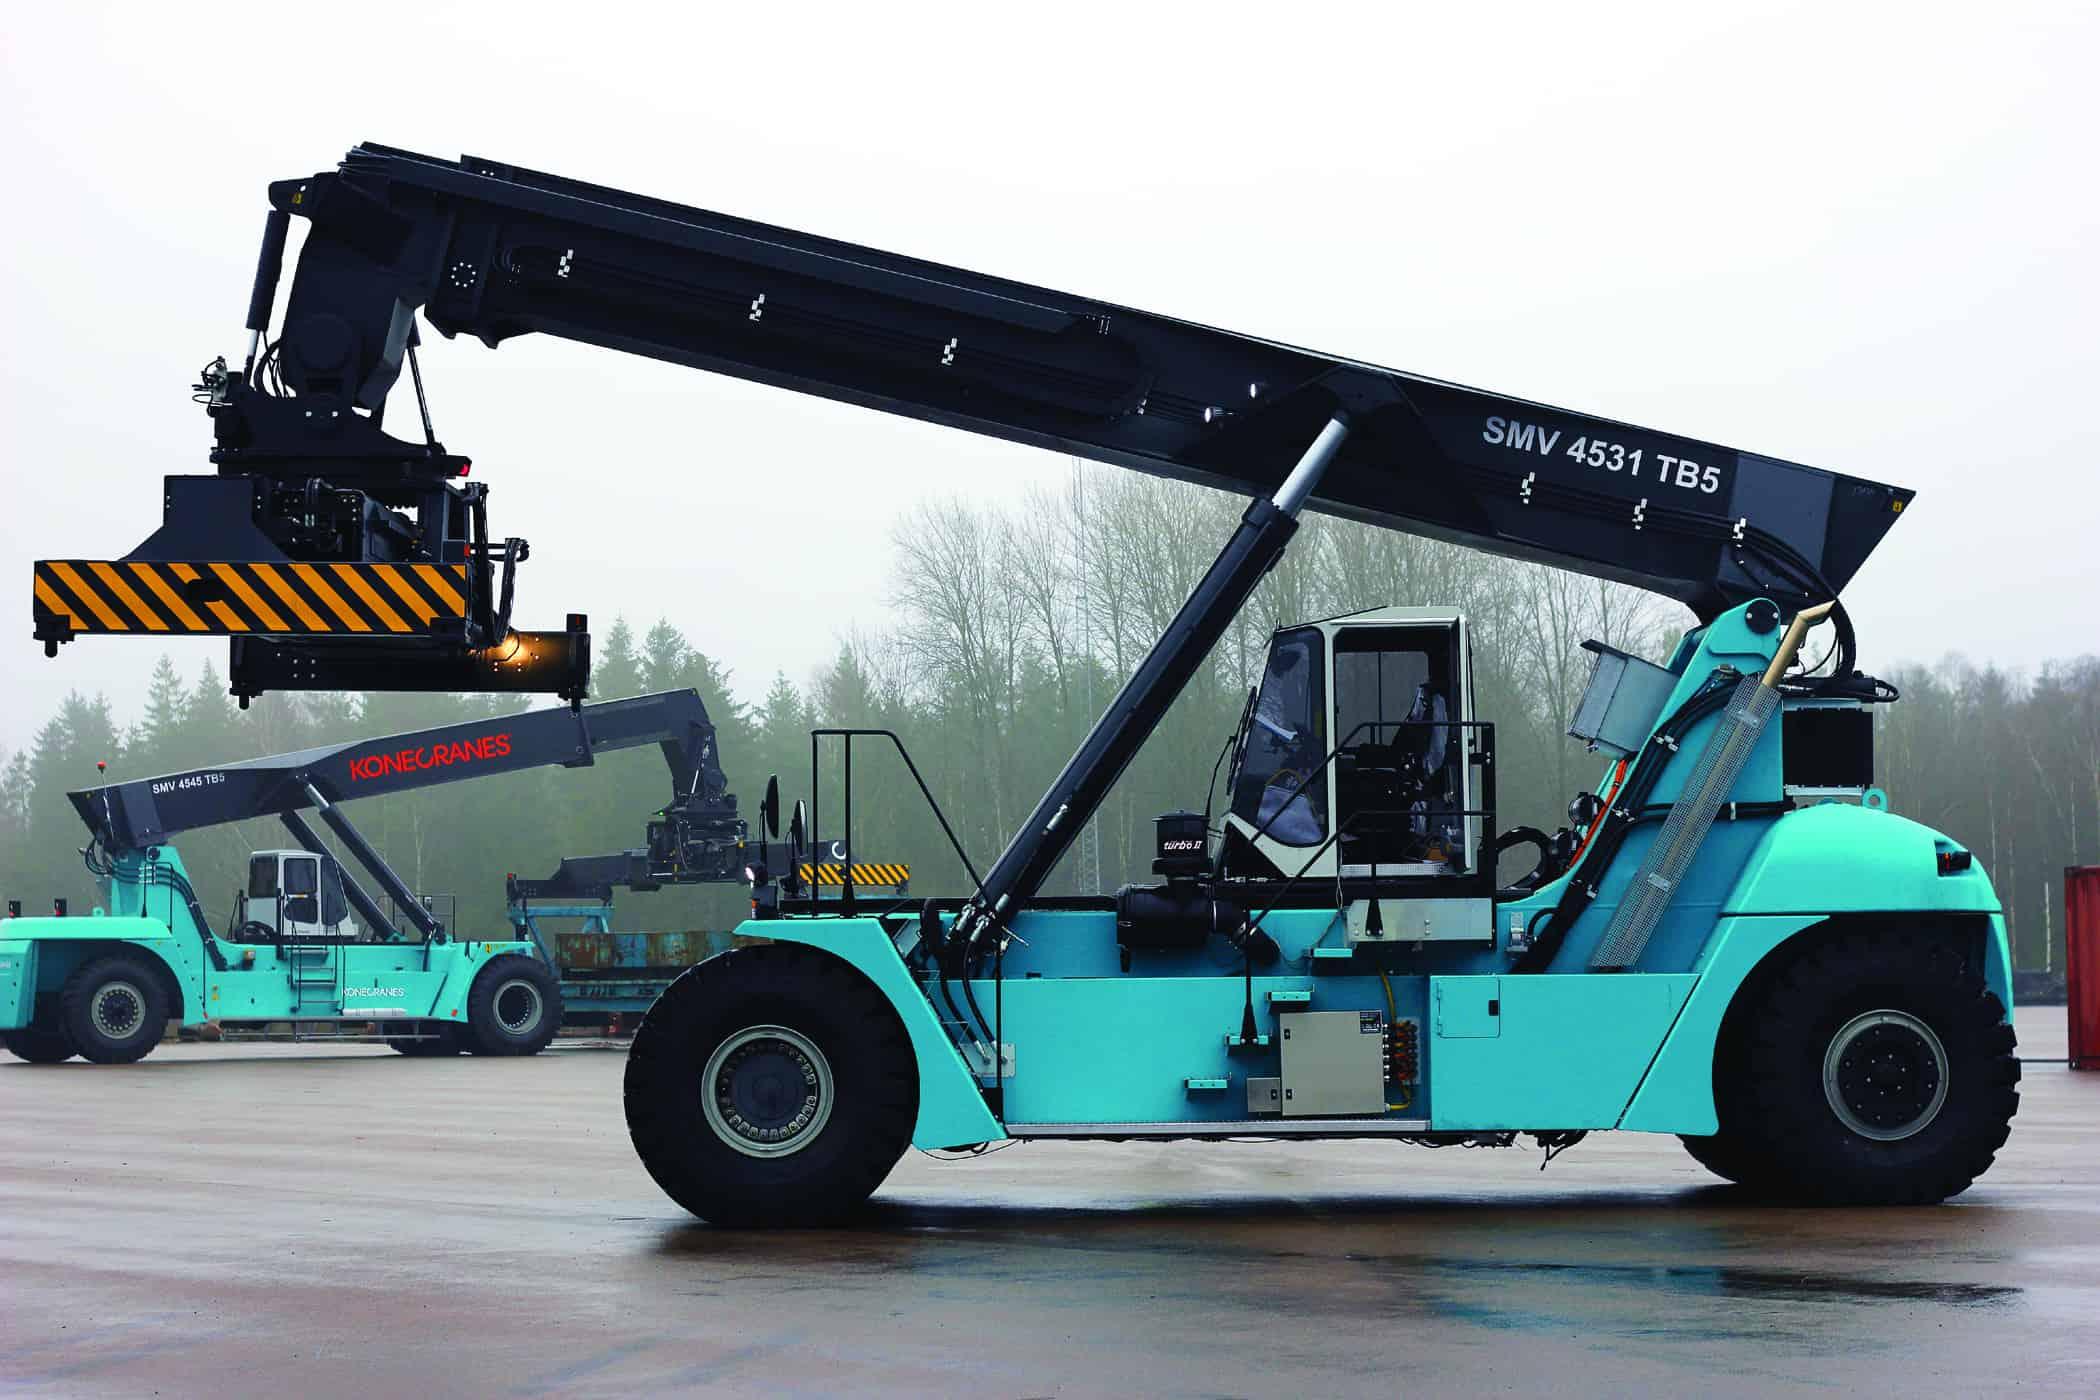 Konecranes proudly presents its new hybrid reachstacker